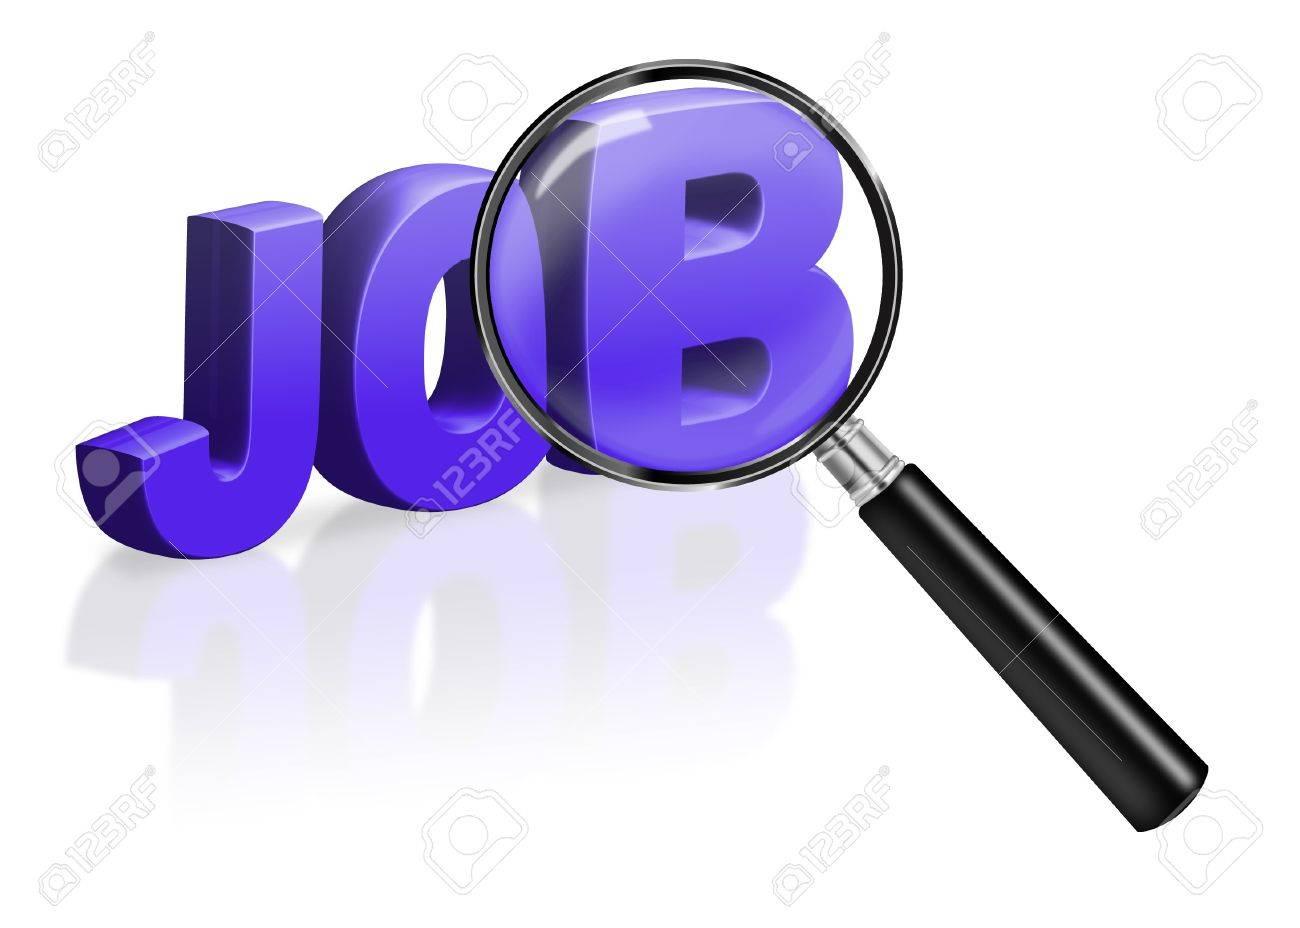 job work search recruitment career vacancy promotion stock photo stock photo job work search recruitment career vacancy promotion